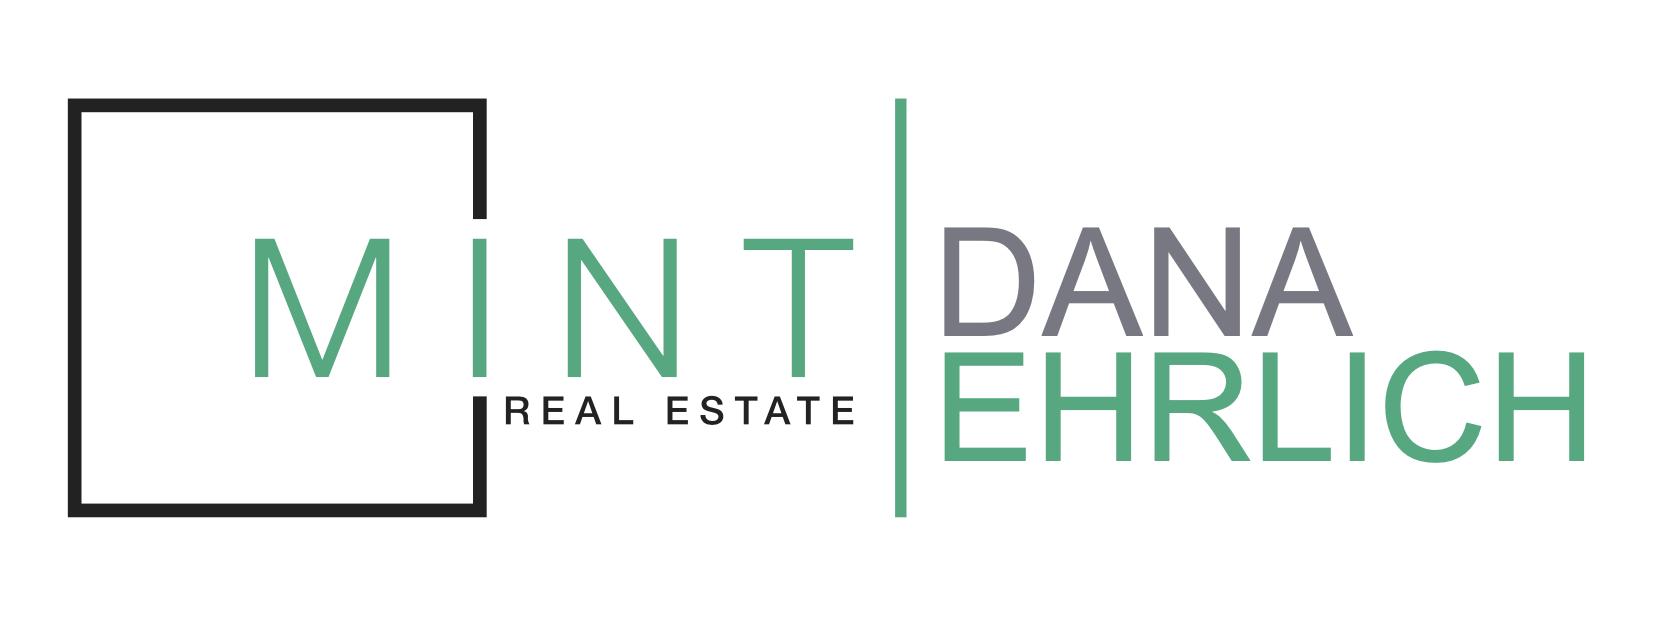 Professional LA Home Sales logo